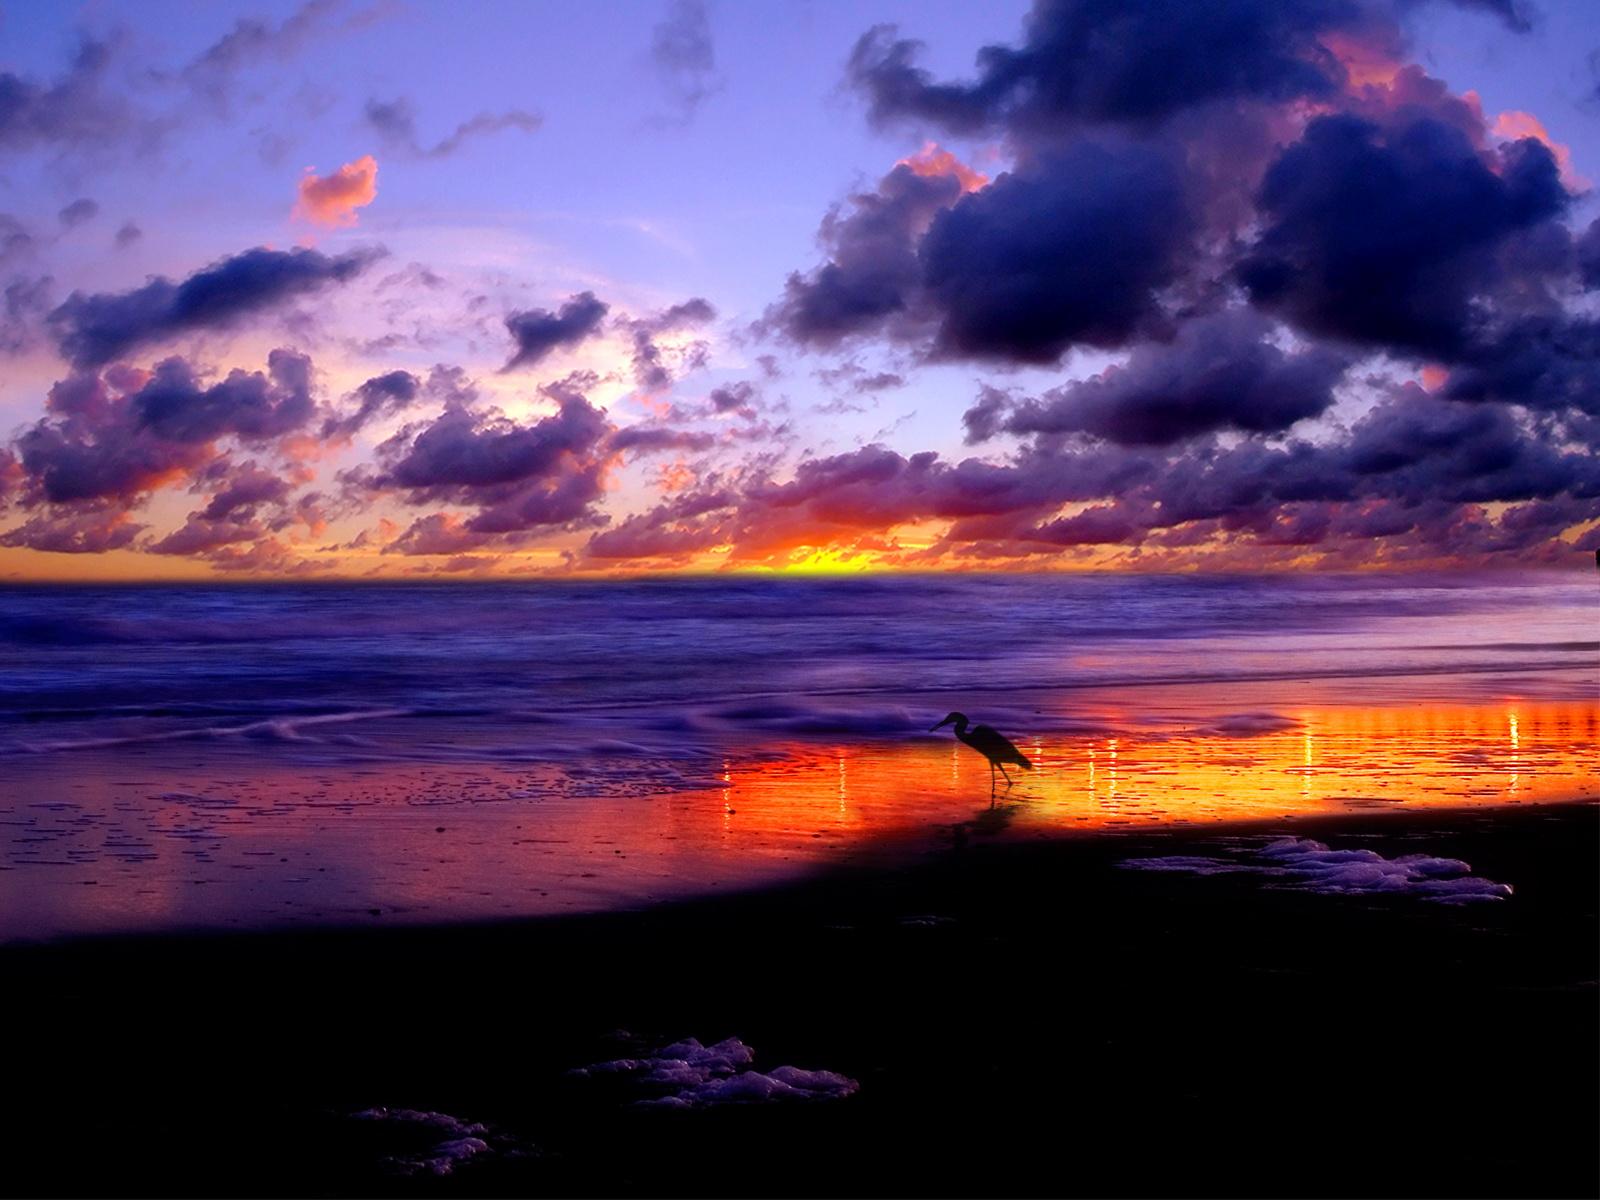 http://3.bp.blogspot.com/-EmRYJ465Nhs/TlADGMBVQyI/AAAAAAAAACw/wtqUqgV3xSg/s1600/nature_0003.jpg